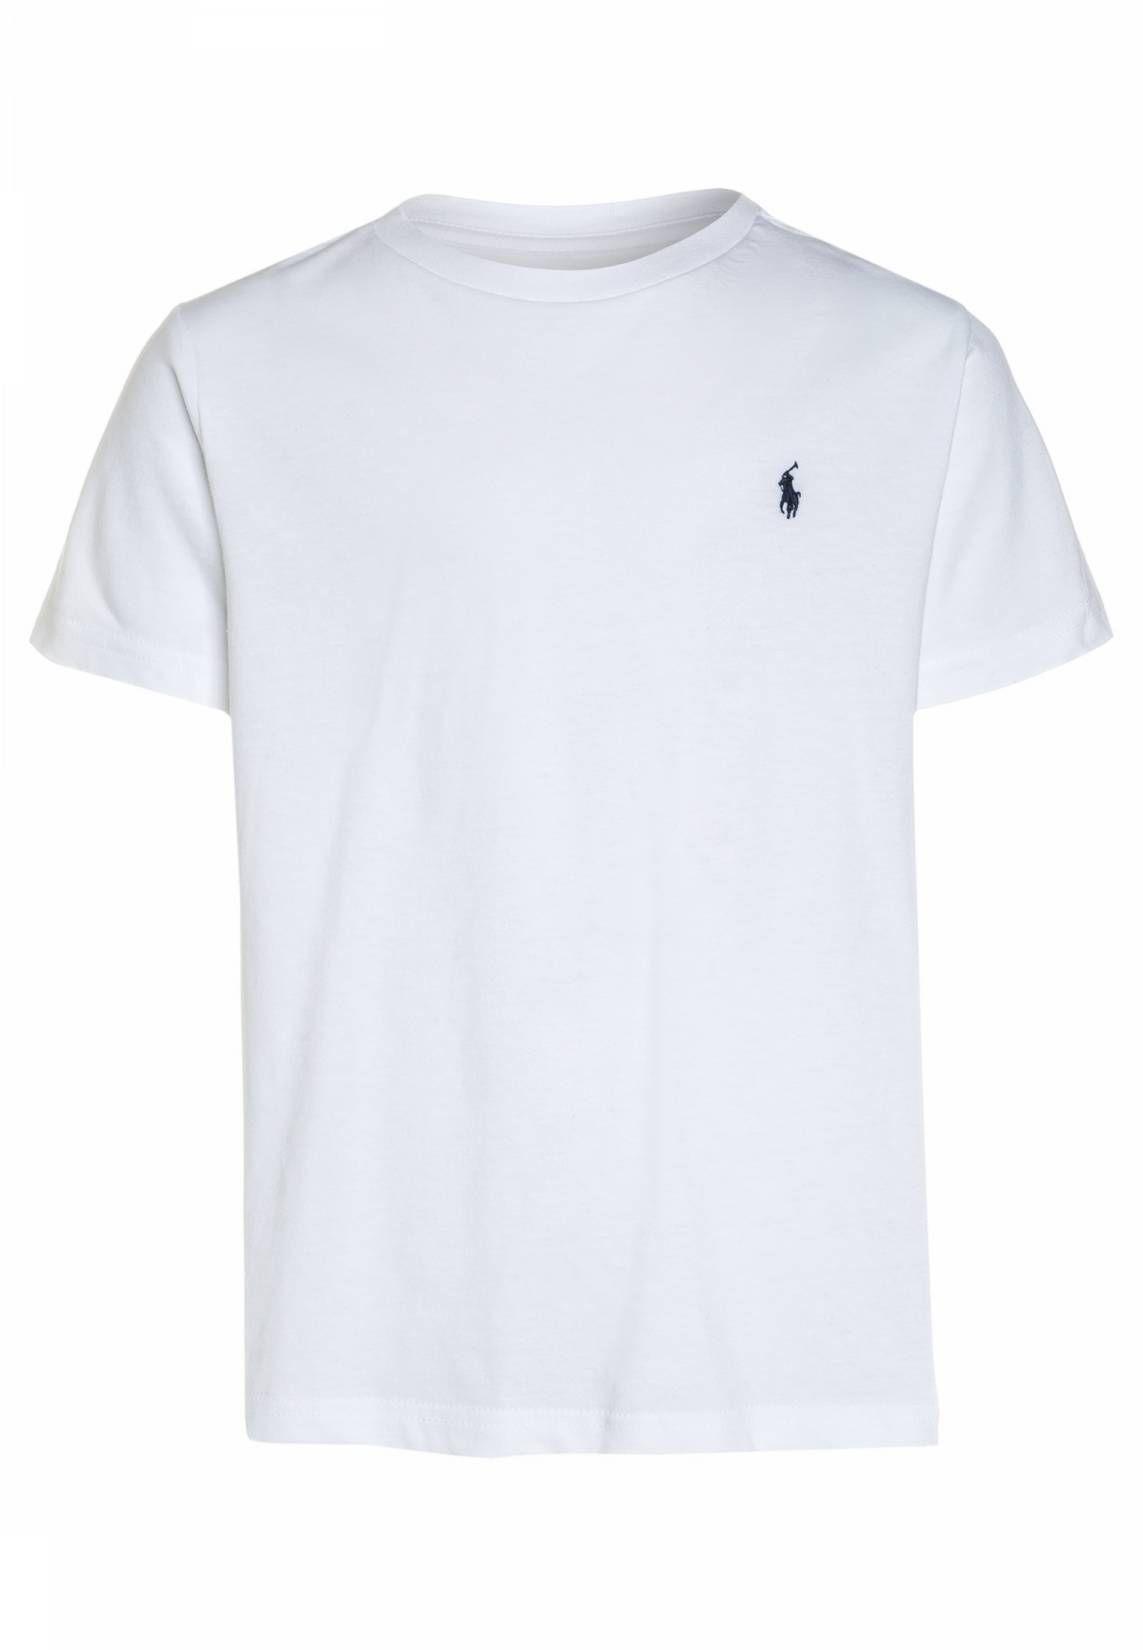 1f30a224d82034 T-shirt basique - white   Zalando ♥ T-shirts   Pinterest   Polo ...